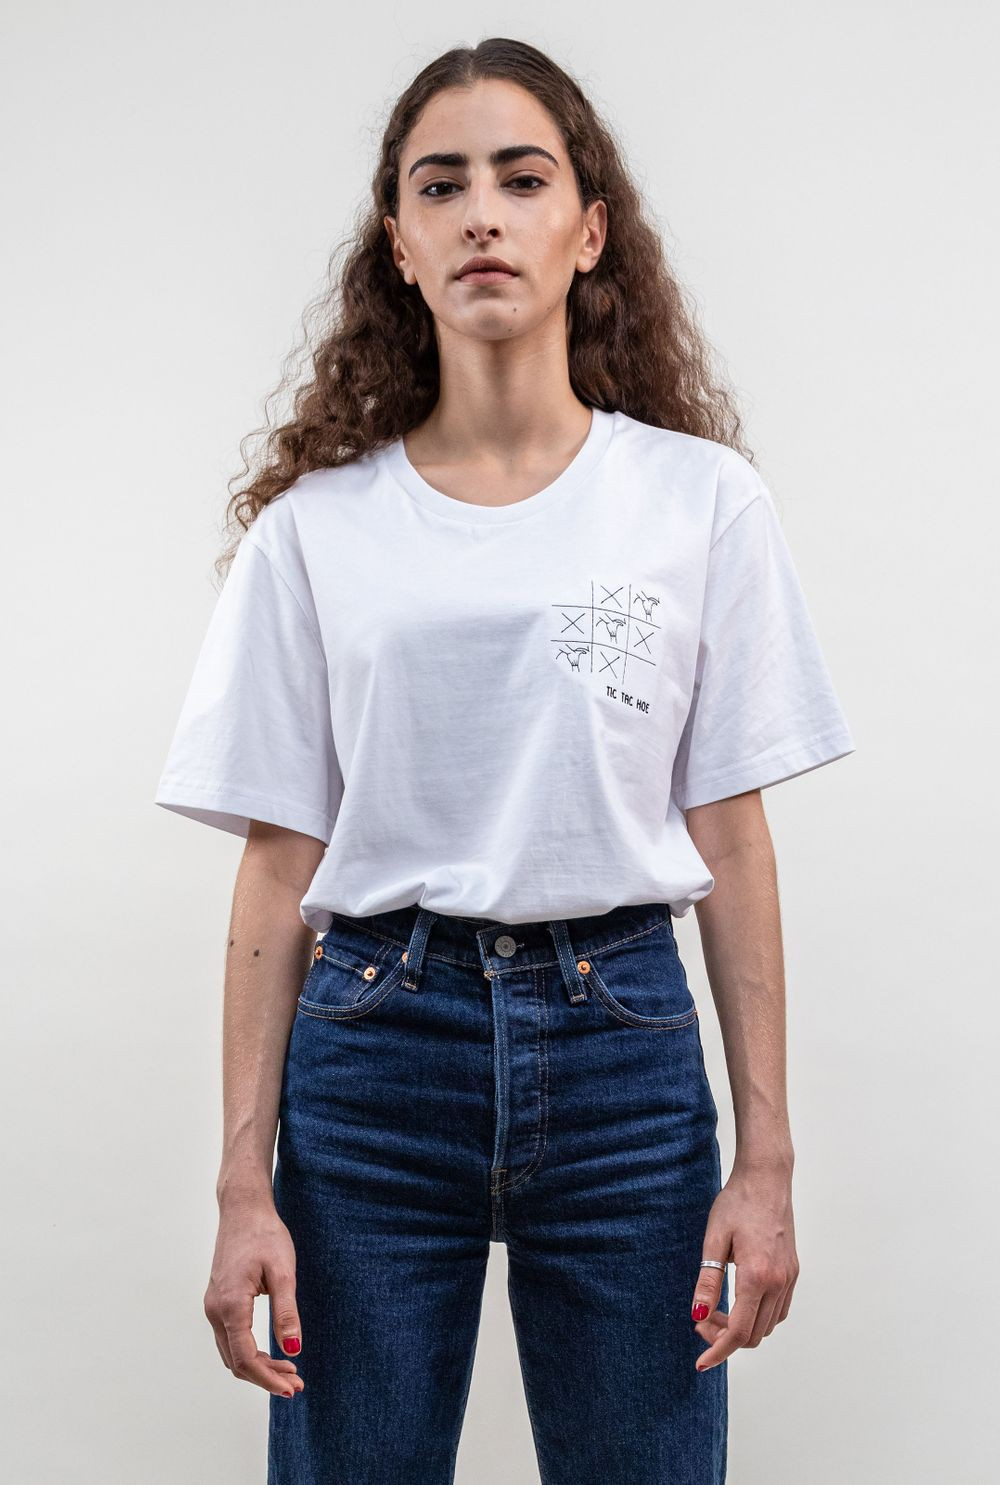 T-shirt Tic Tac Hoe - S - Chaud Marais